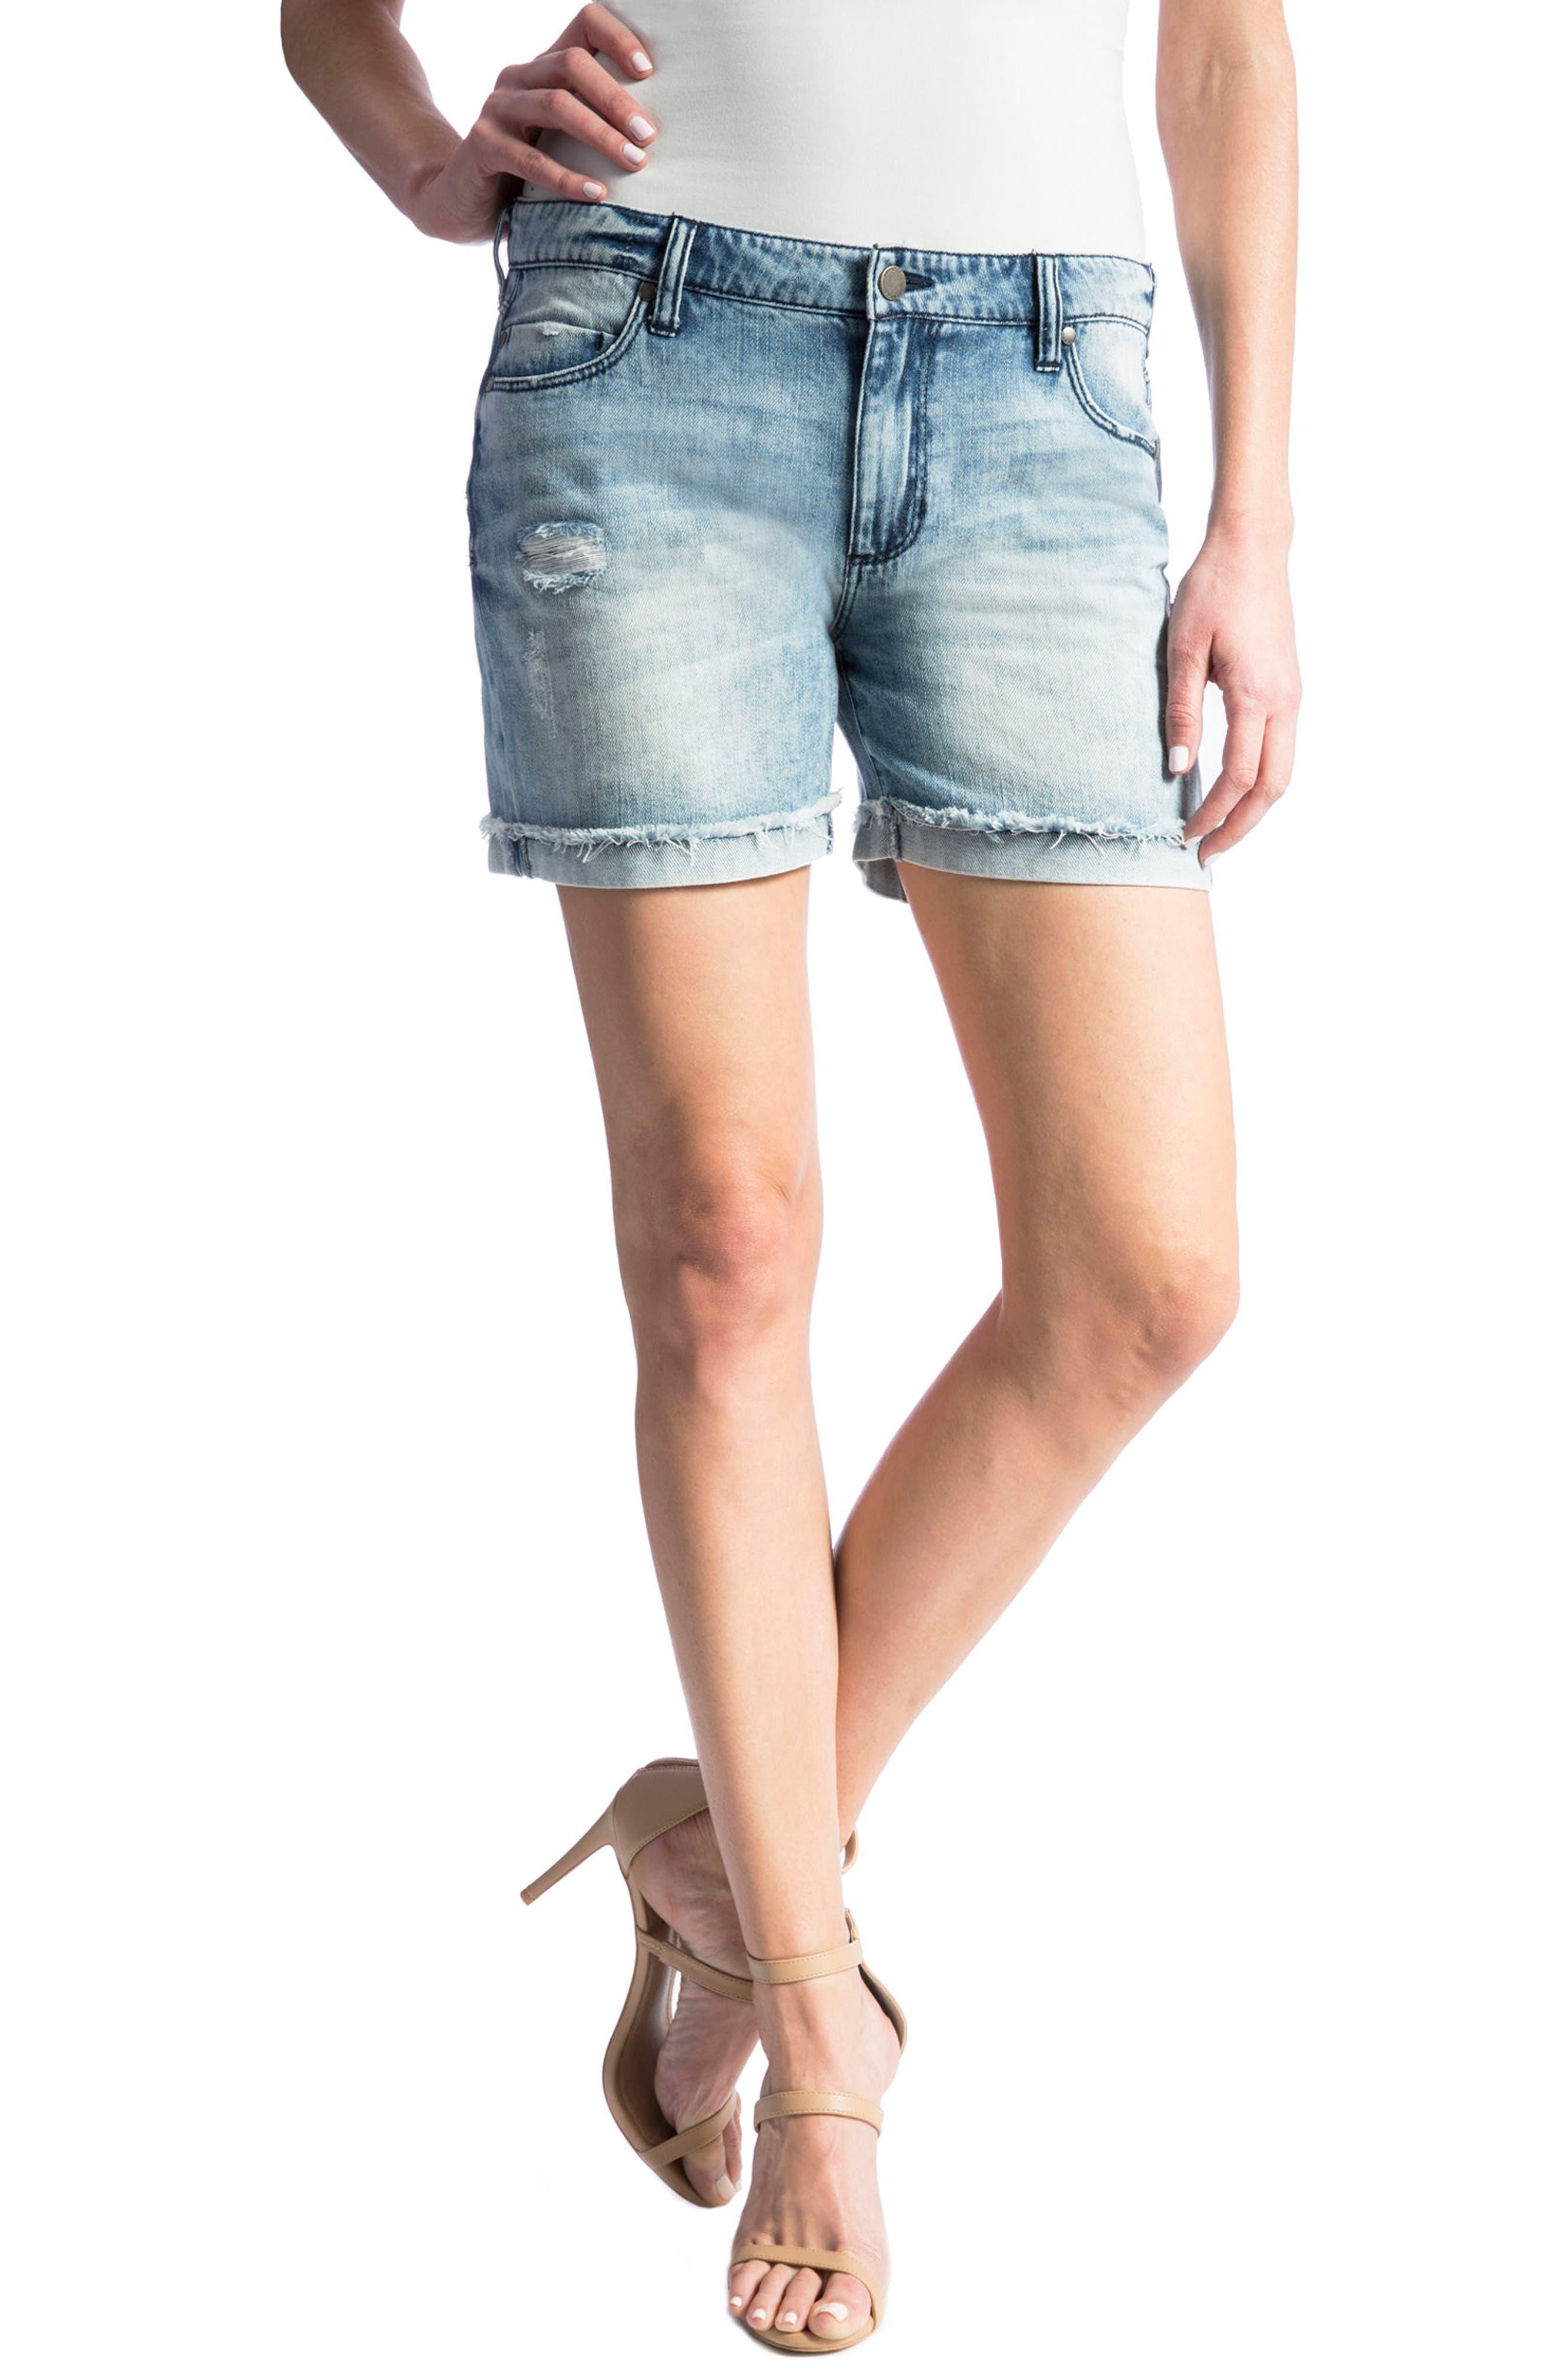 Alternate Image 1 Selected - Liverpool Jeans Company Elliot Denim Boyfriend Shorts (Stockton Destruct)